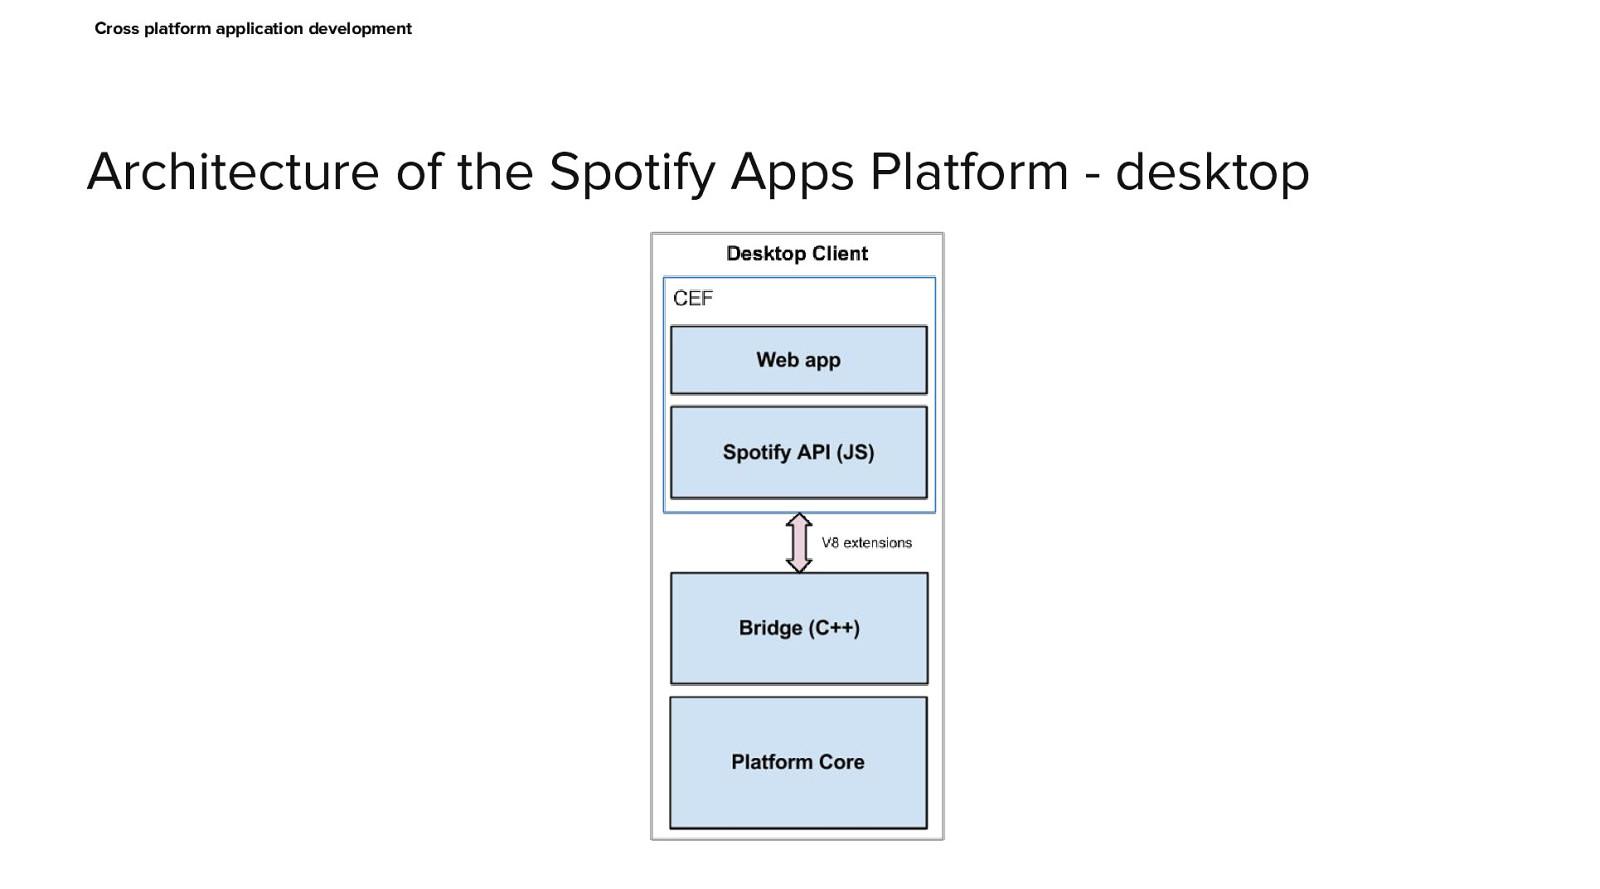 Cross platform web app development